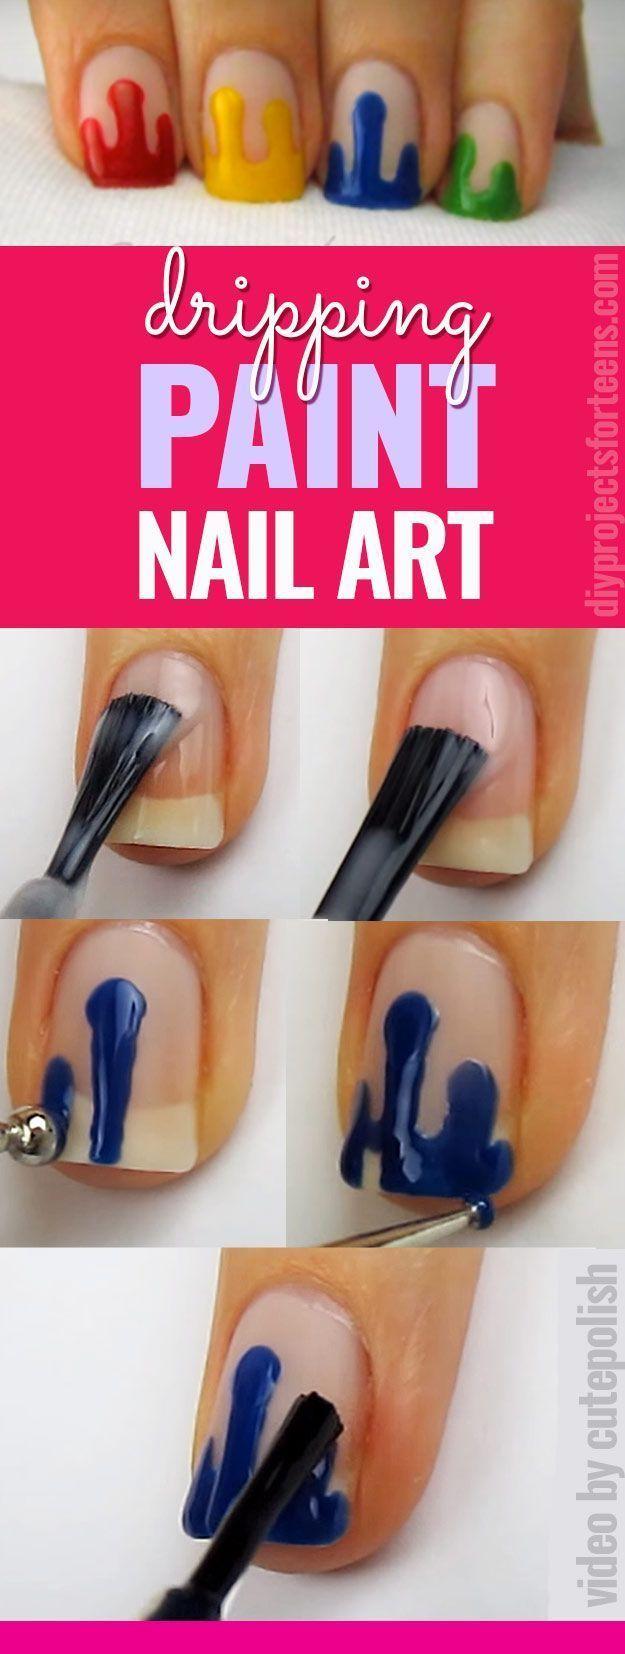 Cool nail art ideas dripping paint nail polish fun for teens and